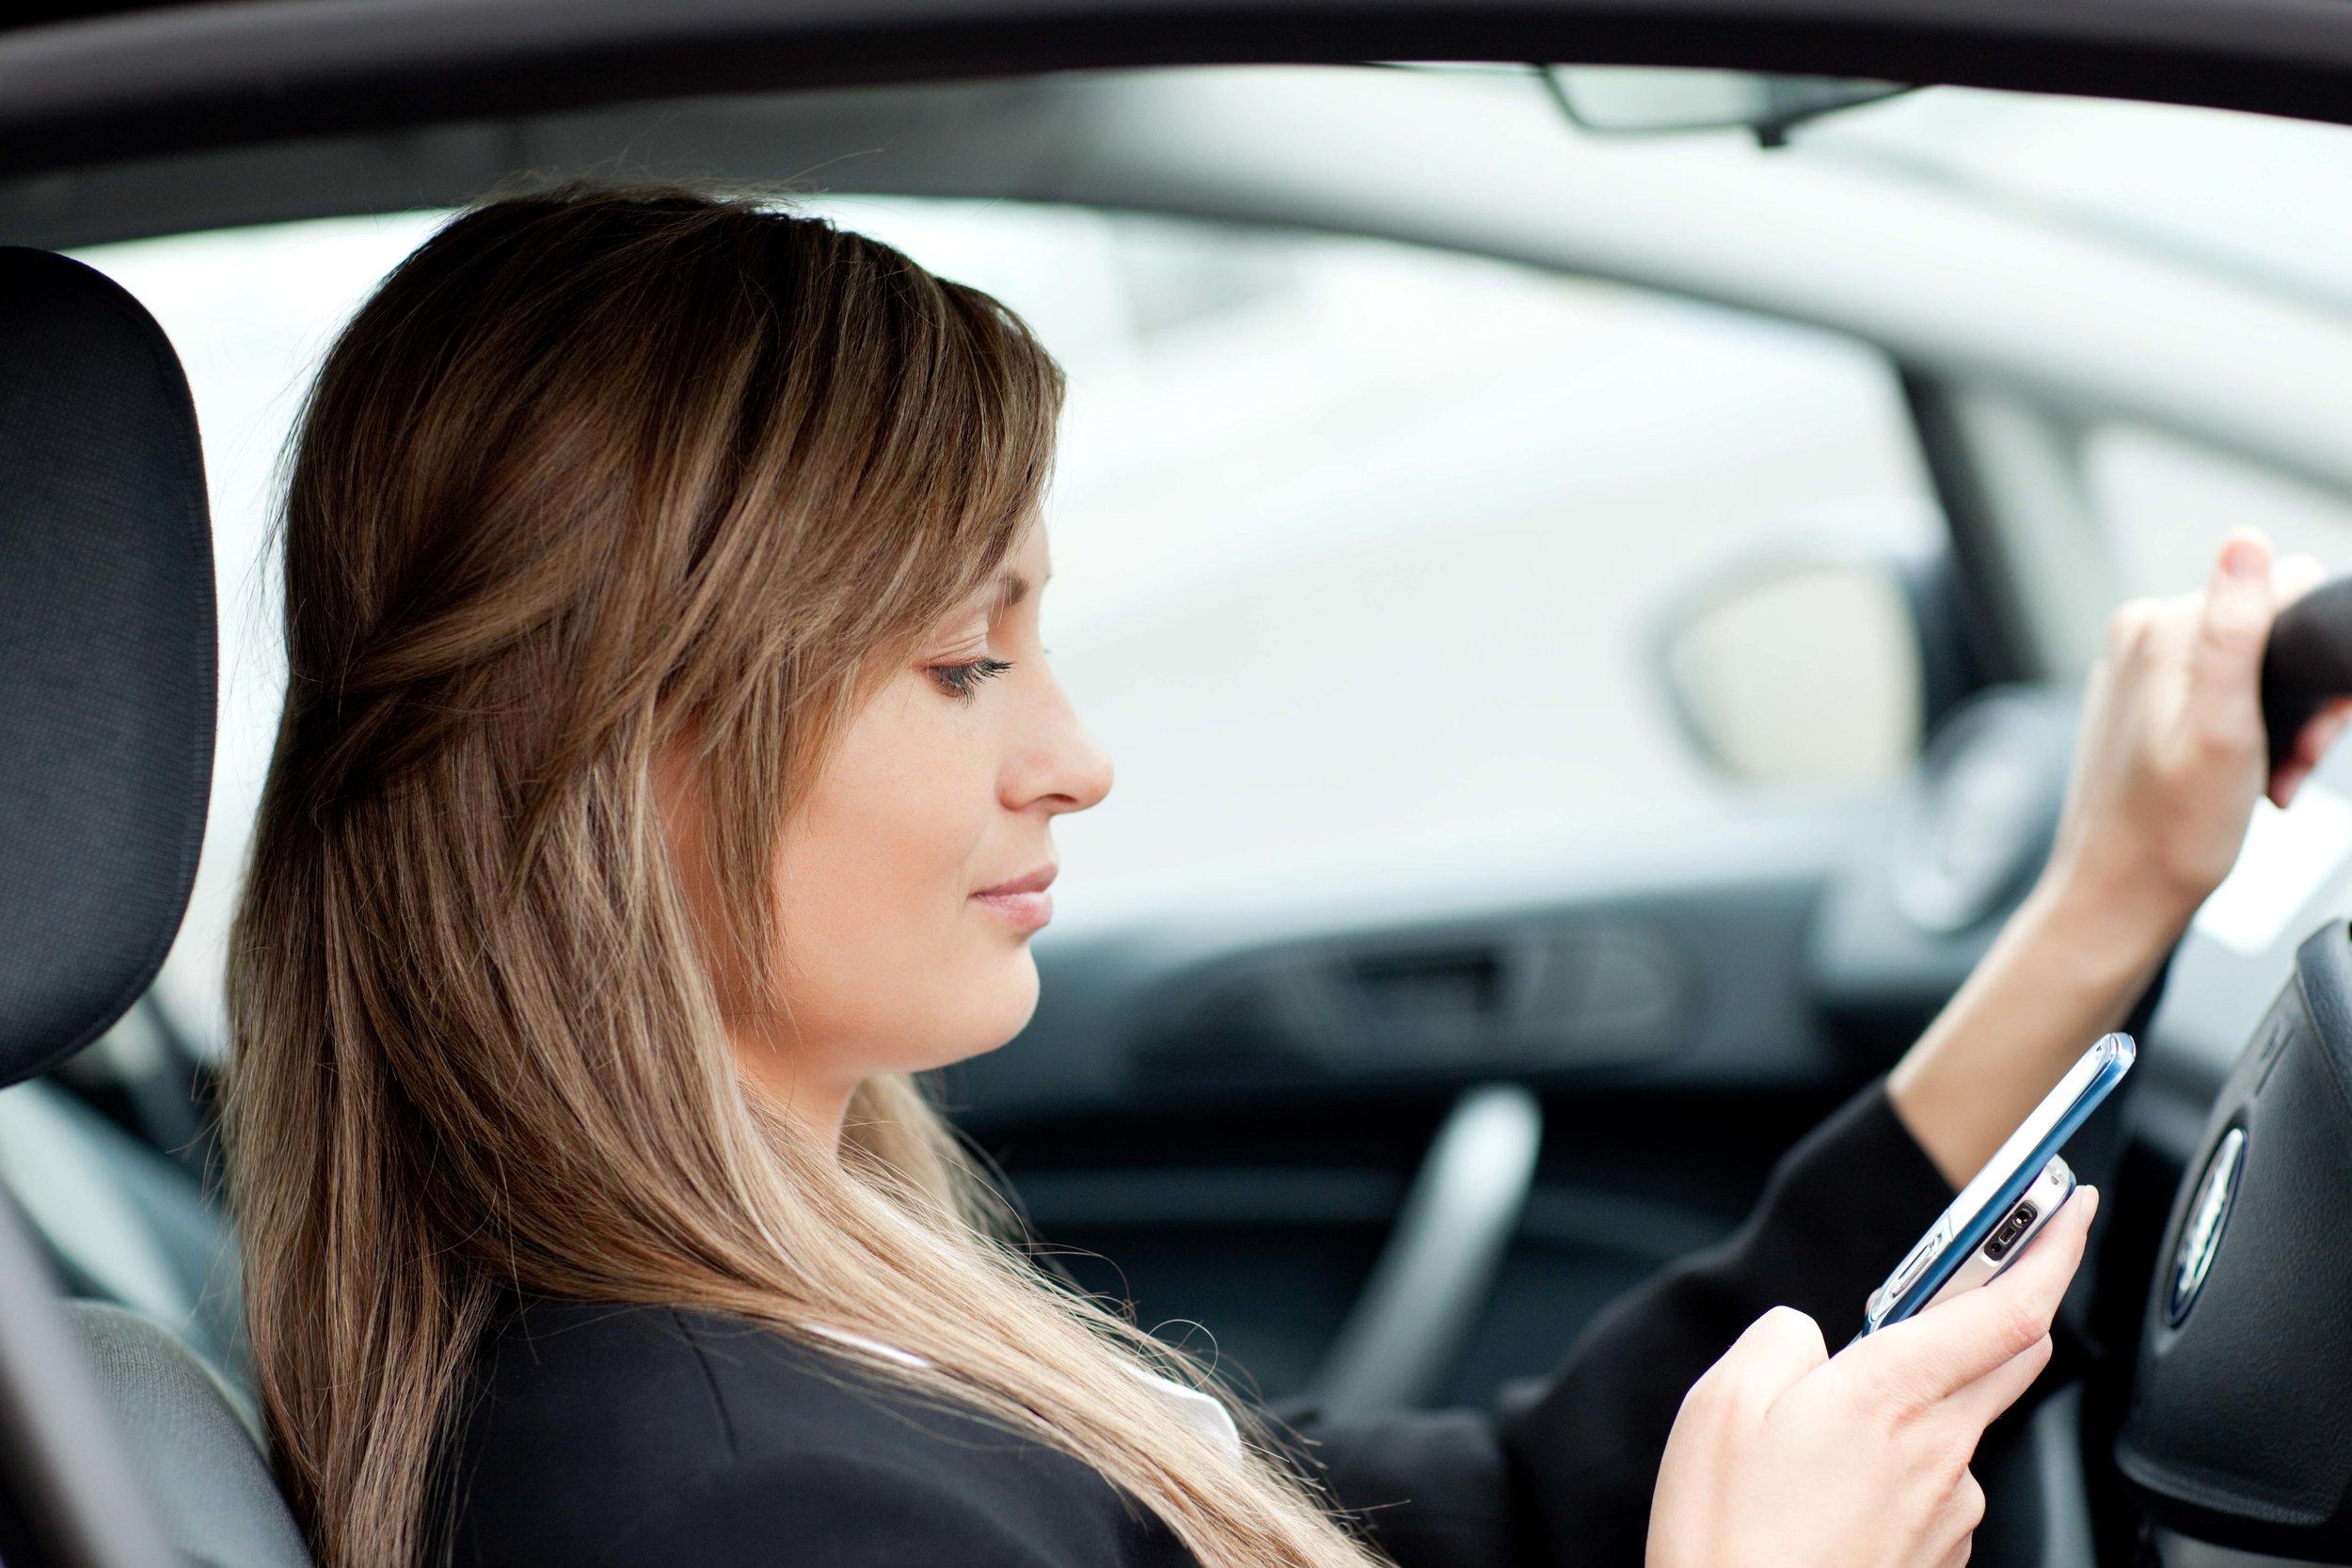 phones-driving-low-res.jpg